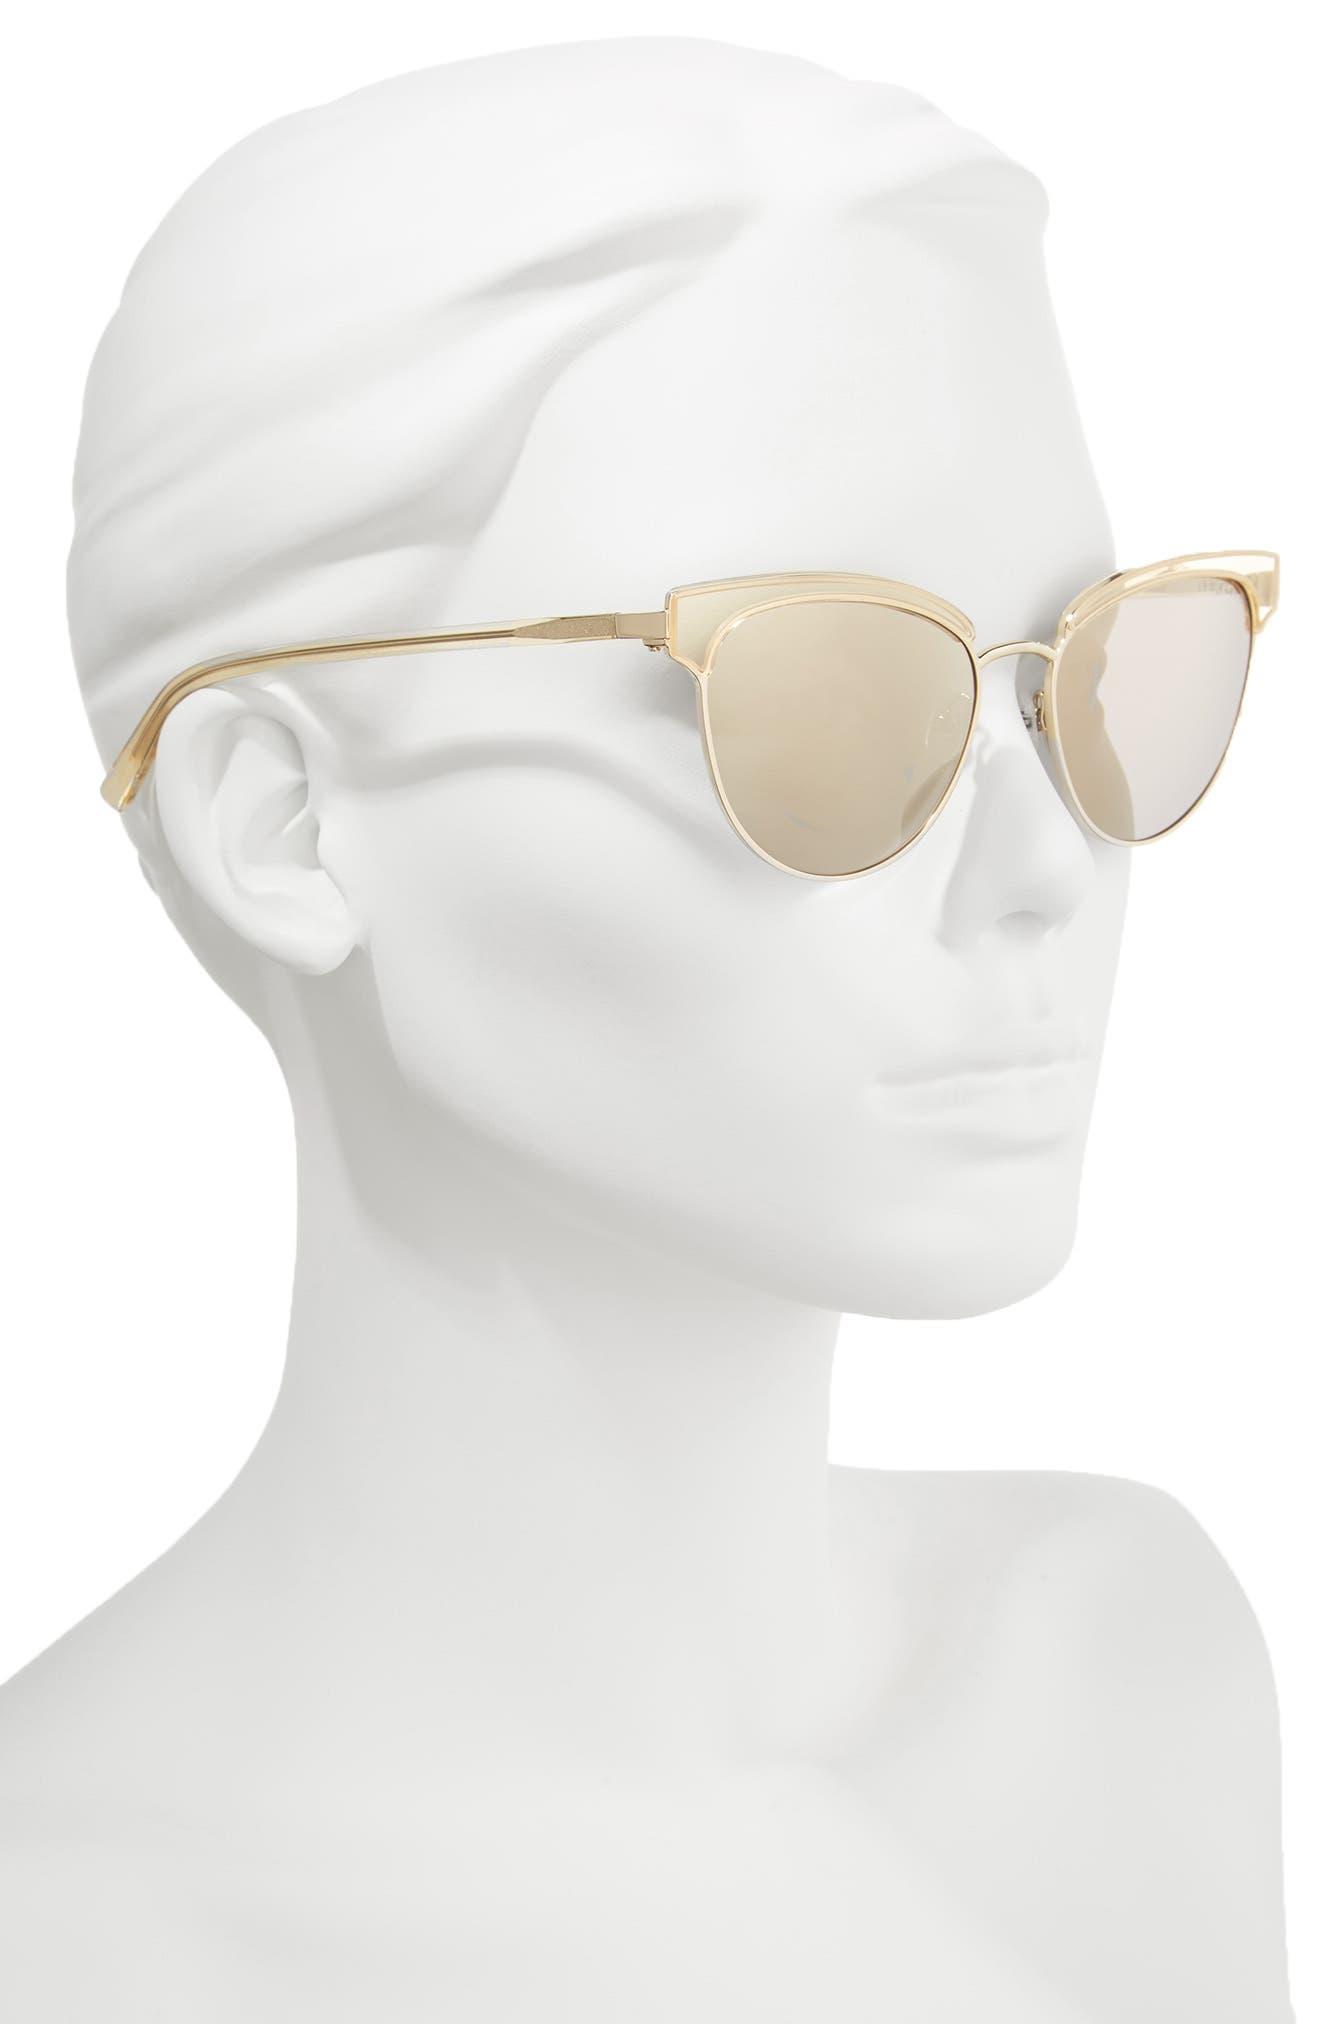 55mm Mirrored Semi Rimless Cat Eye Sunglasses,                             Alternate thumbnail 2, color,                             710